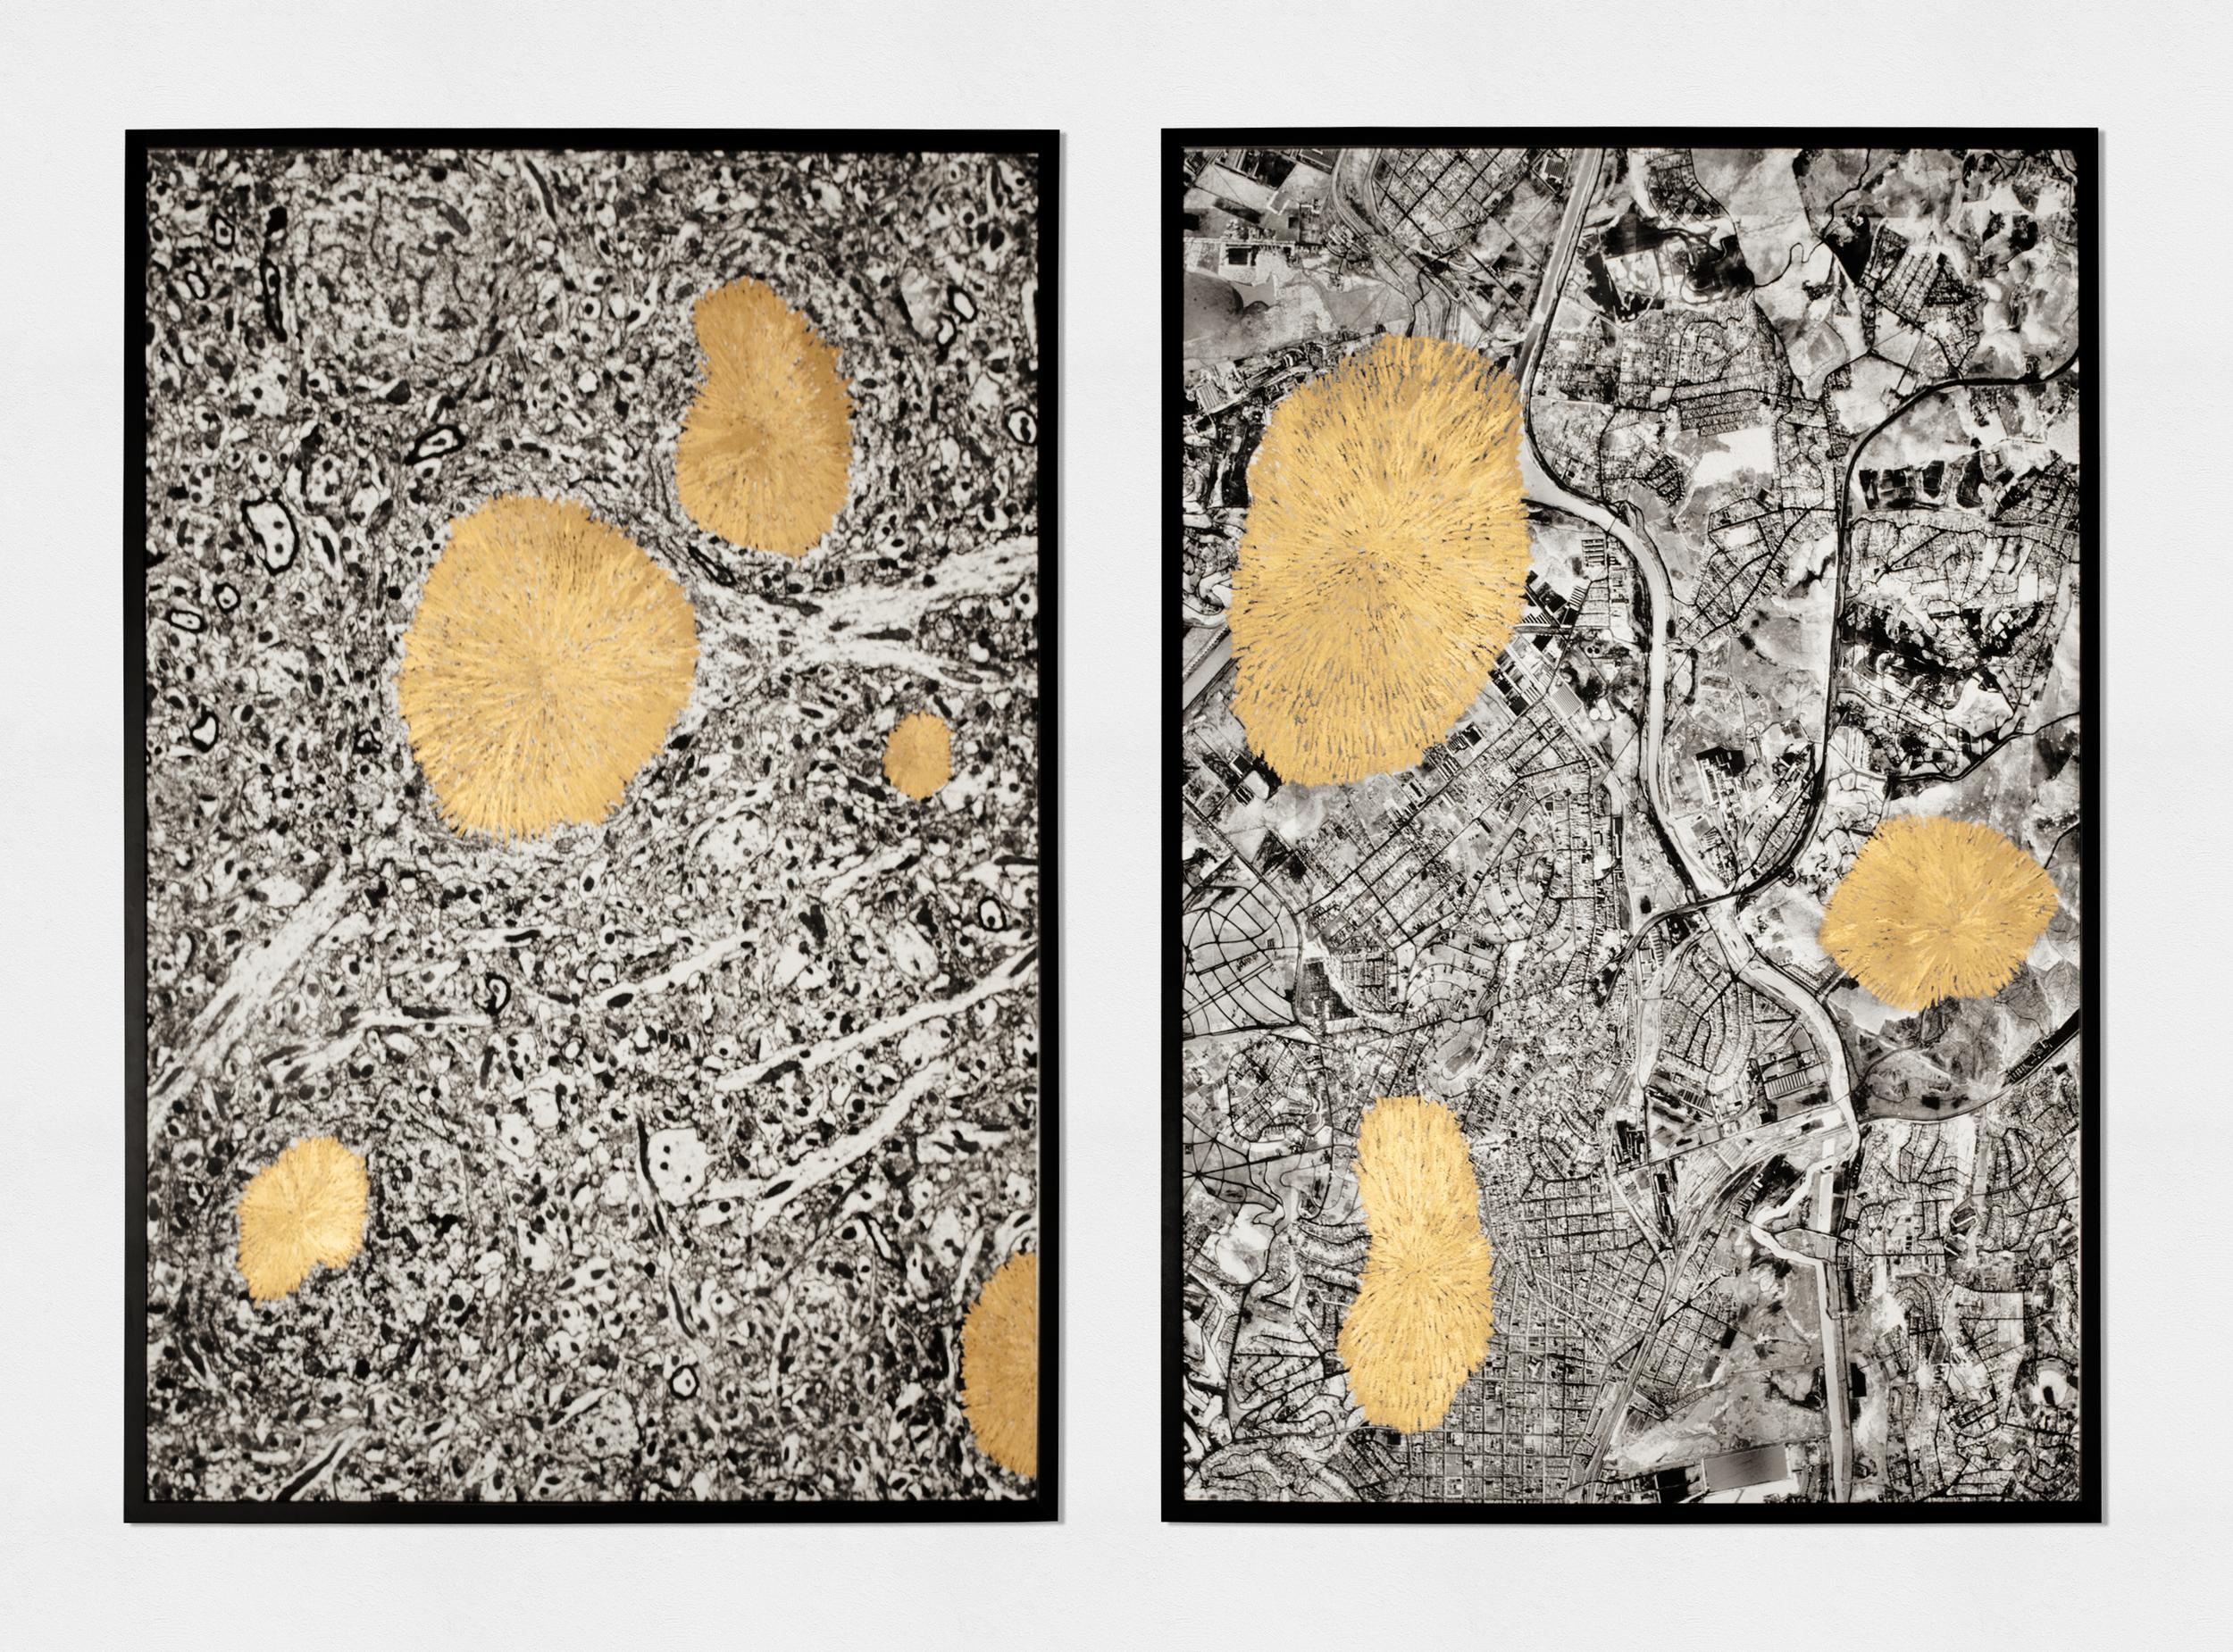 são paulo (2015)  ( oil pastel, 1980s micrograph & 1950s aerial photographs printed on fine art paper, 120cm X 80cm each)